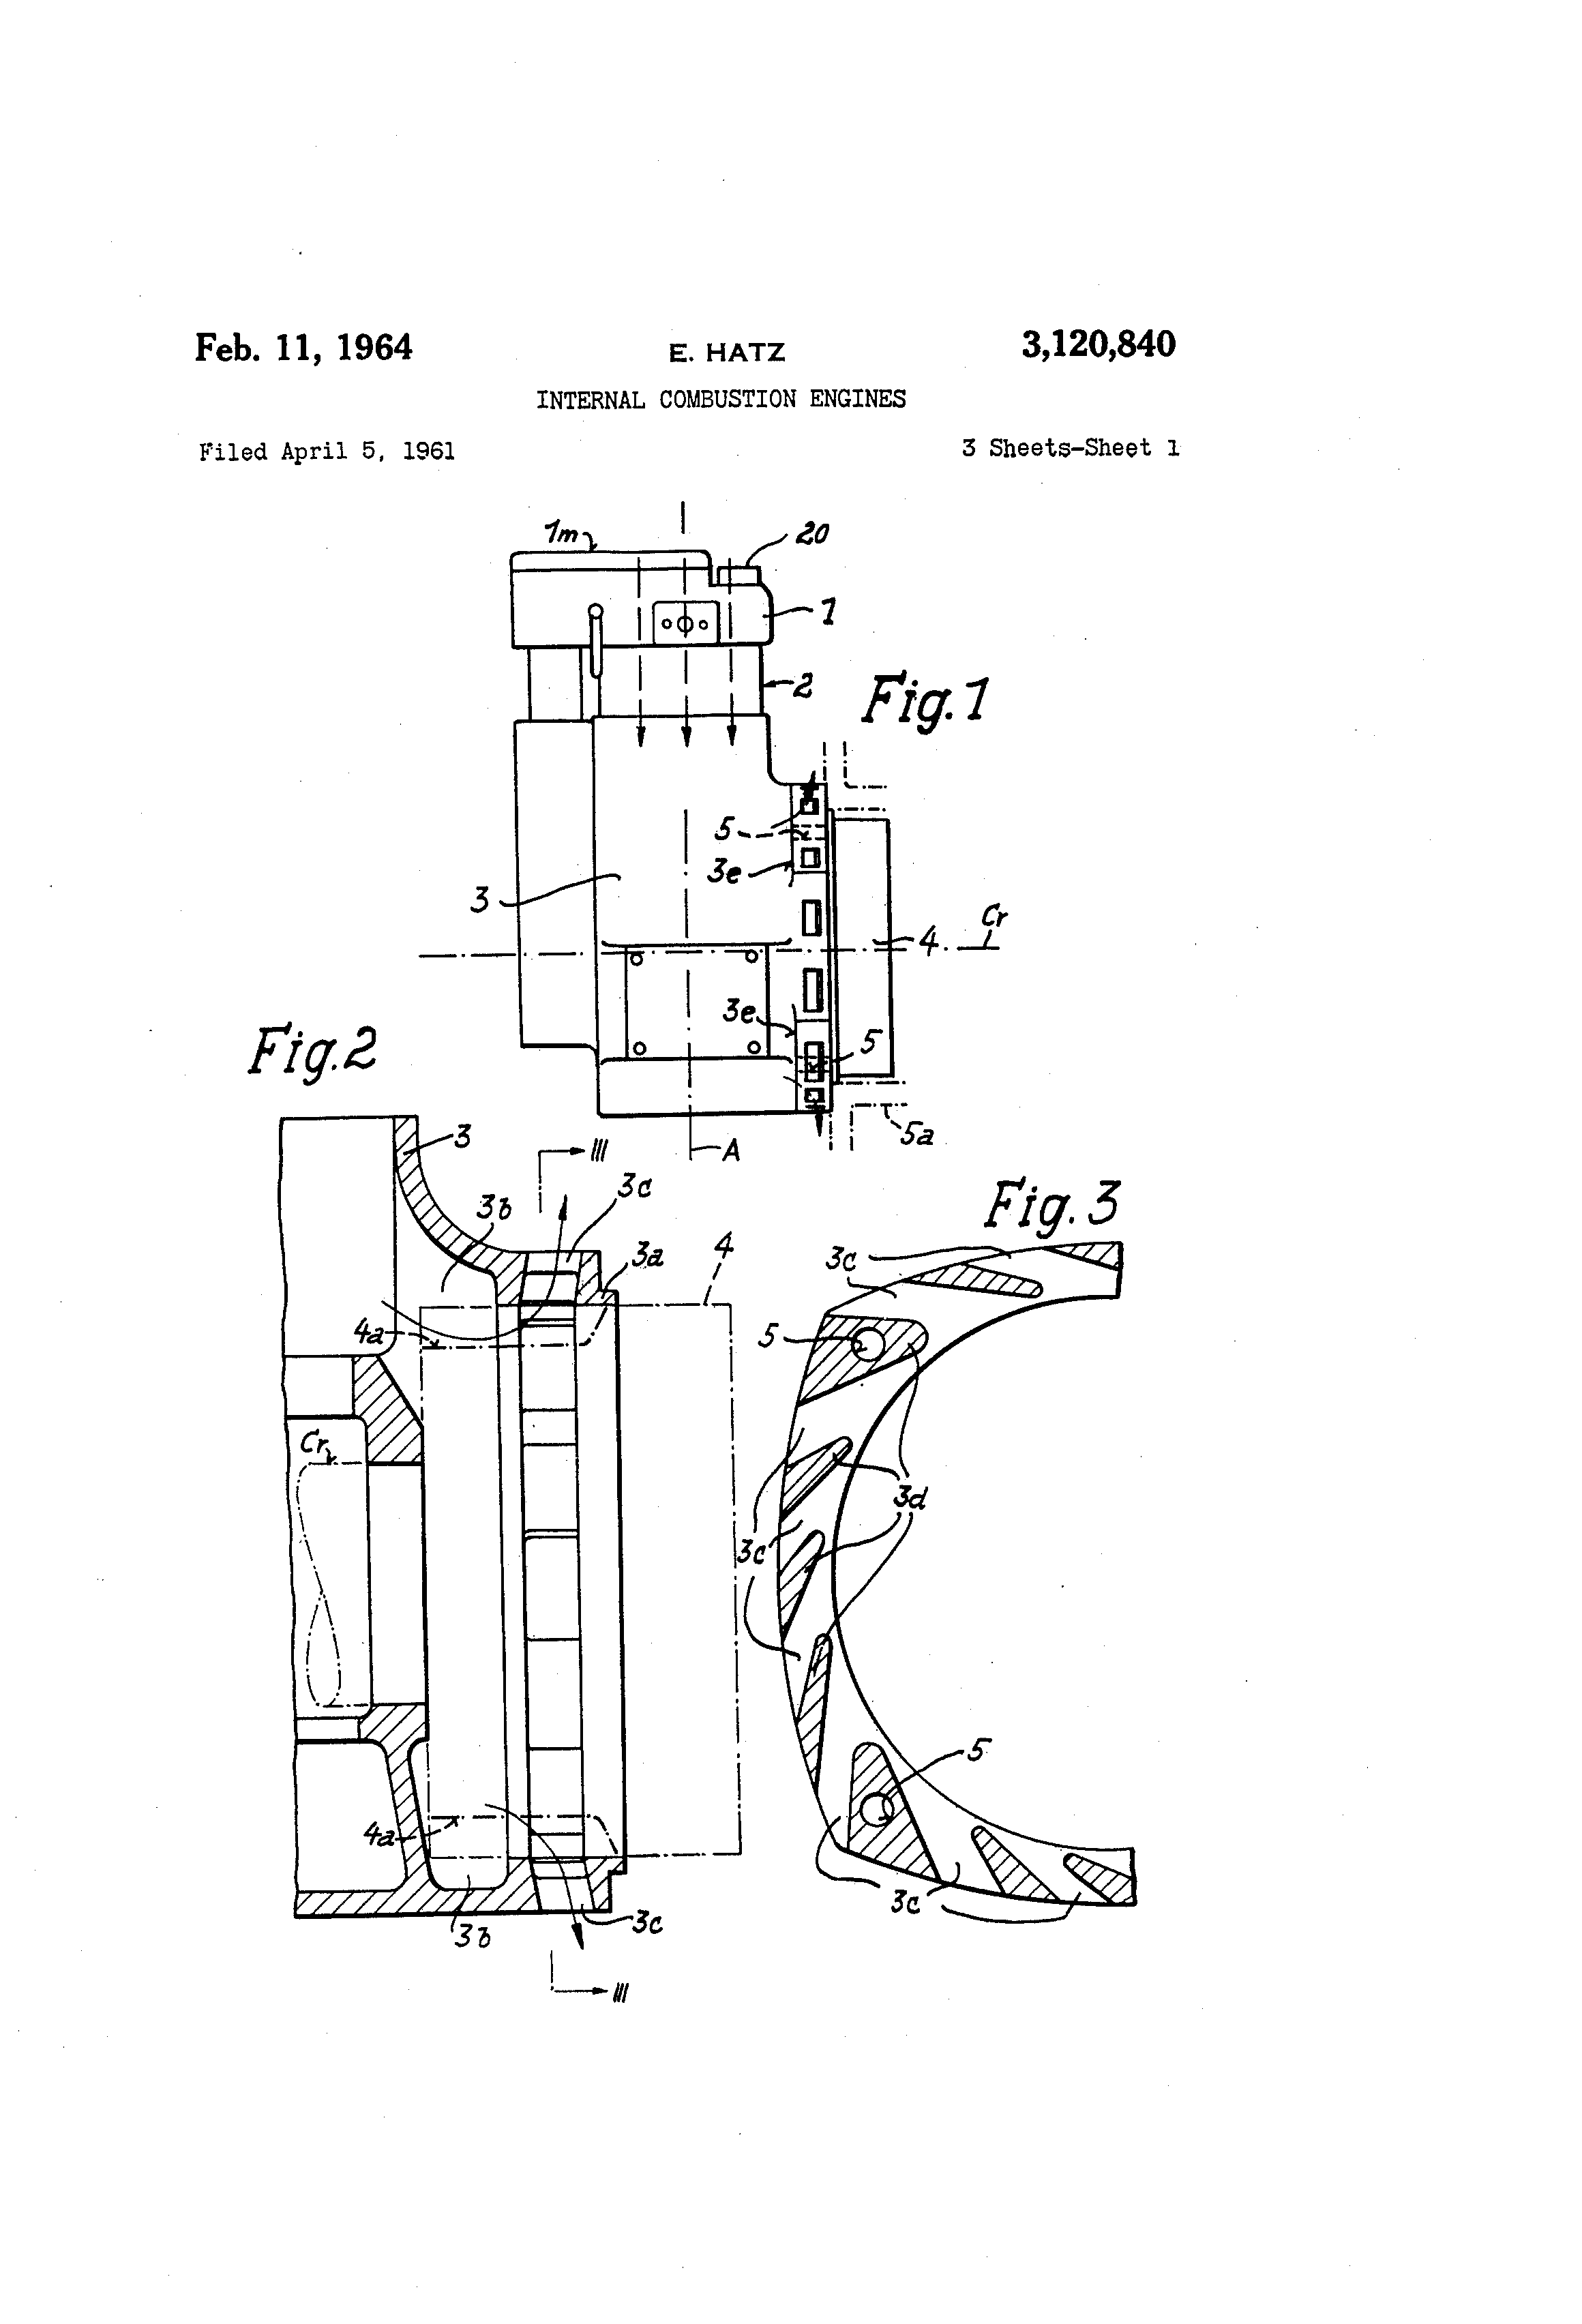 Brevet Us3120840 Internal Combustion Engines Google Brevets Hatz Engine Diagram Patent Drawing